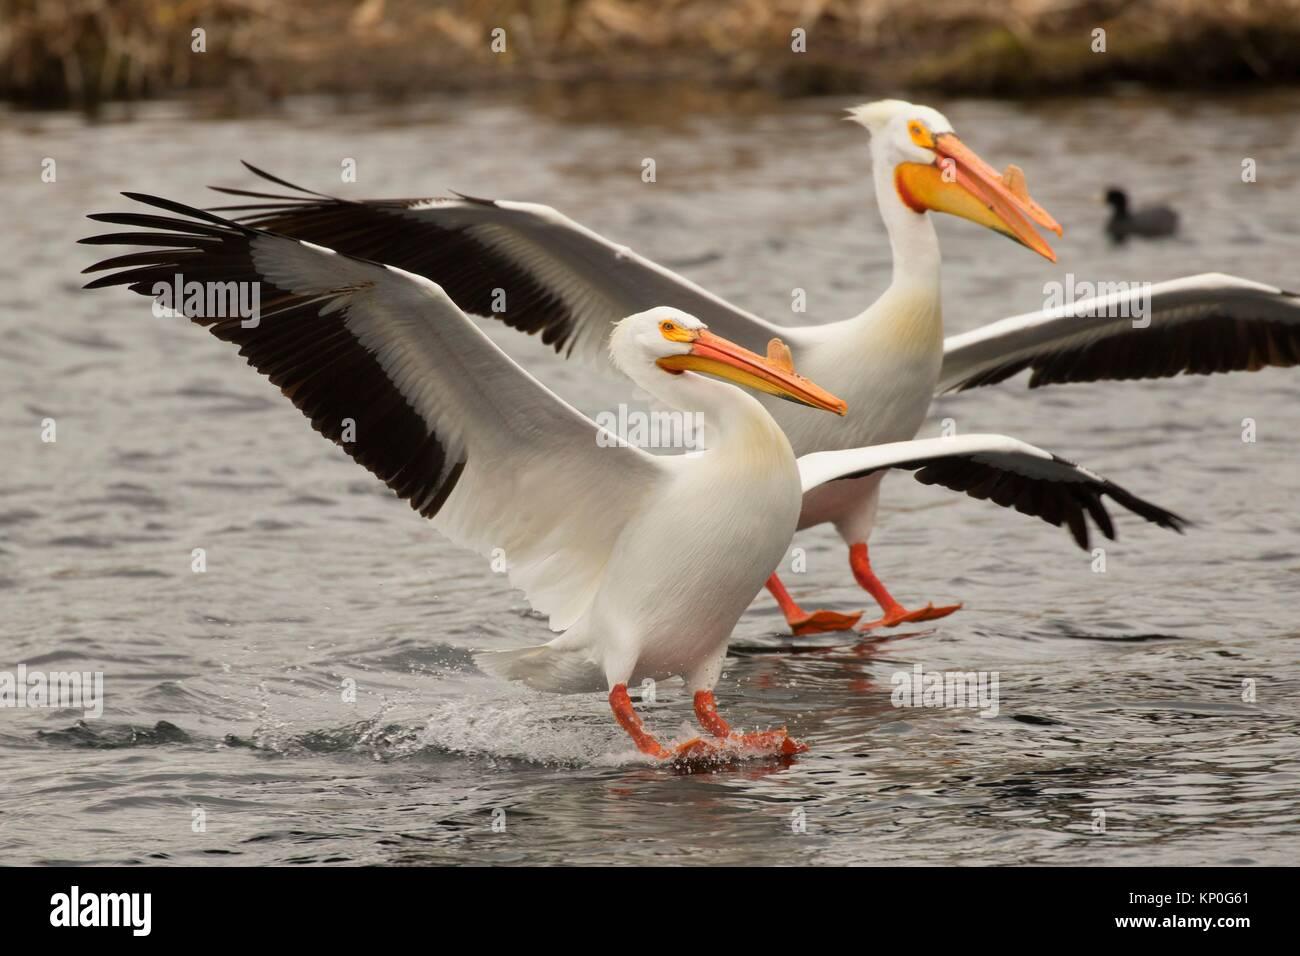 American White Pelican (Pelecanus erythrorhynchos), Rocky Ford Creek Zugang zu Wasser, Washington. Stockbild